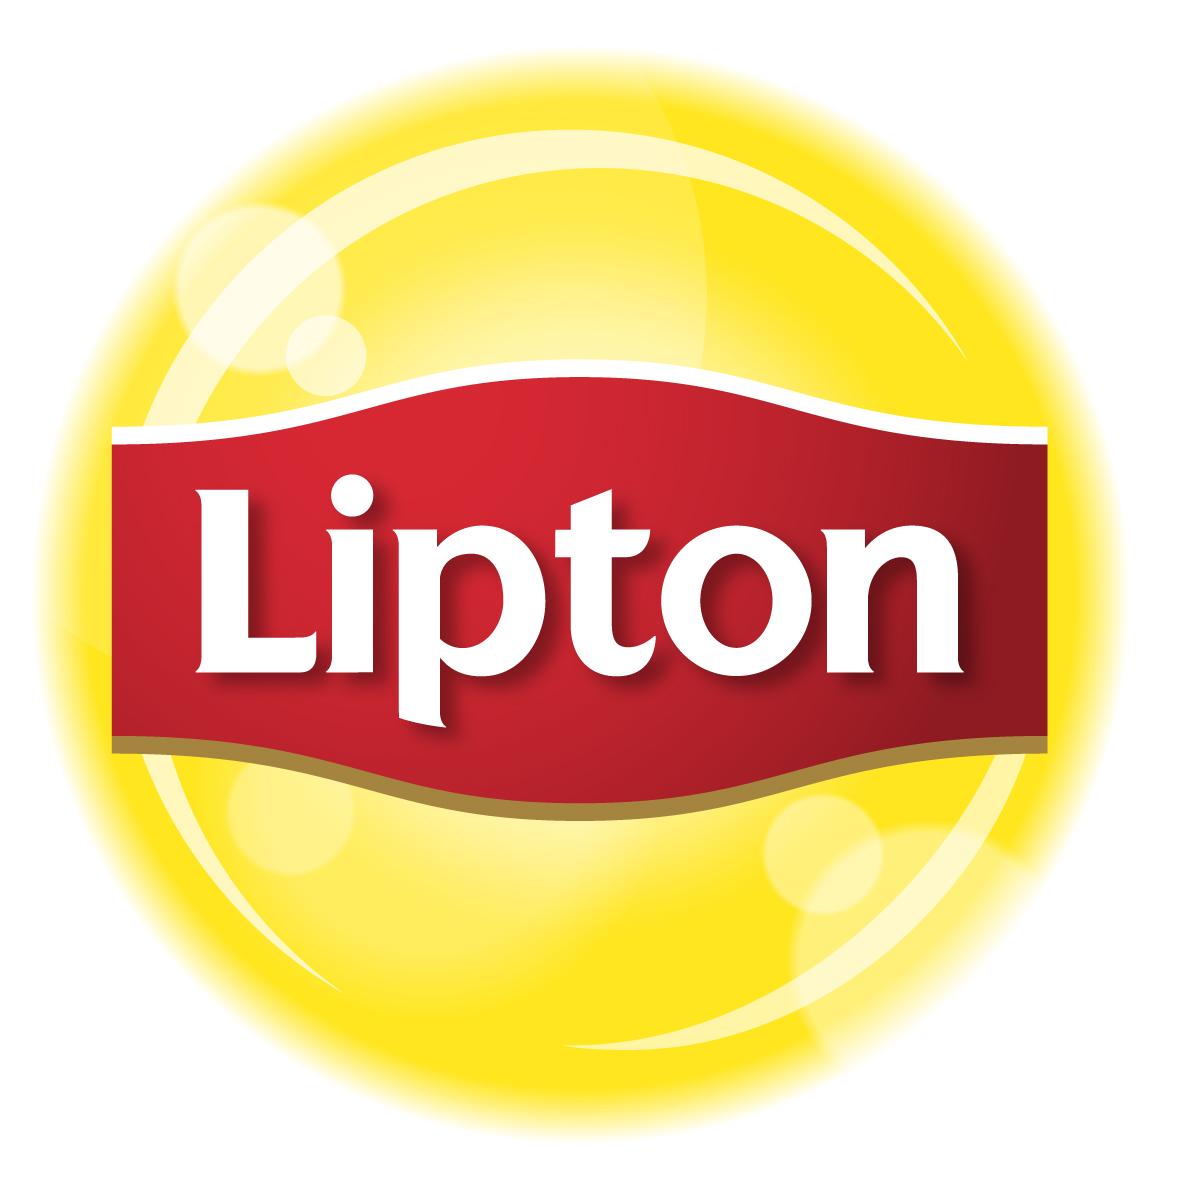 Lipton logo